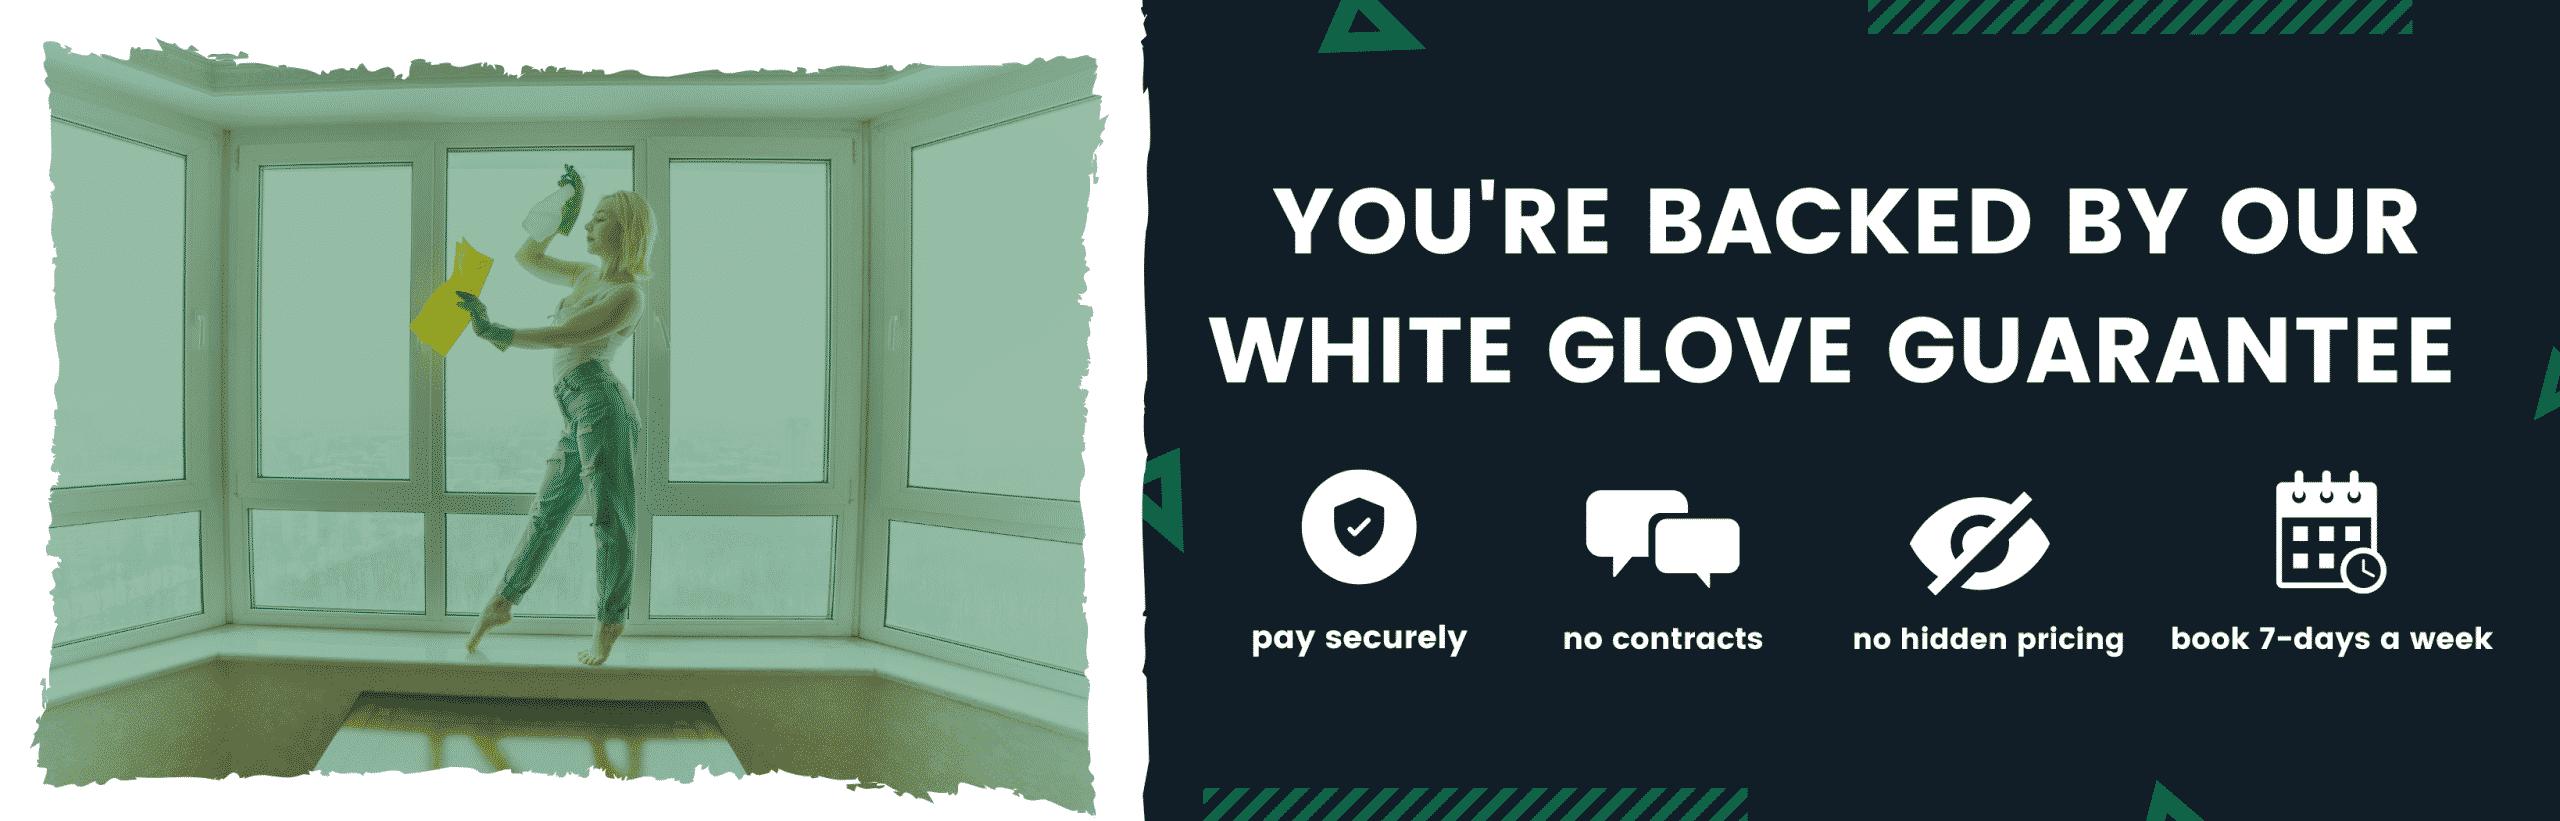 hometress white glove guarantee Center City Philadelphia pa